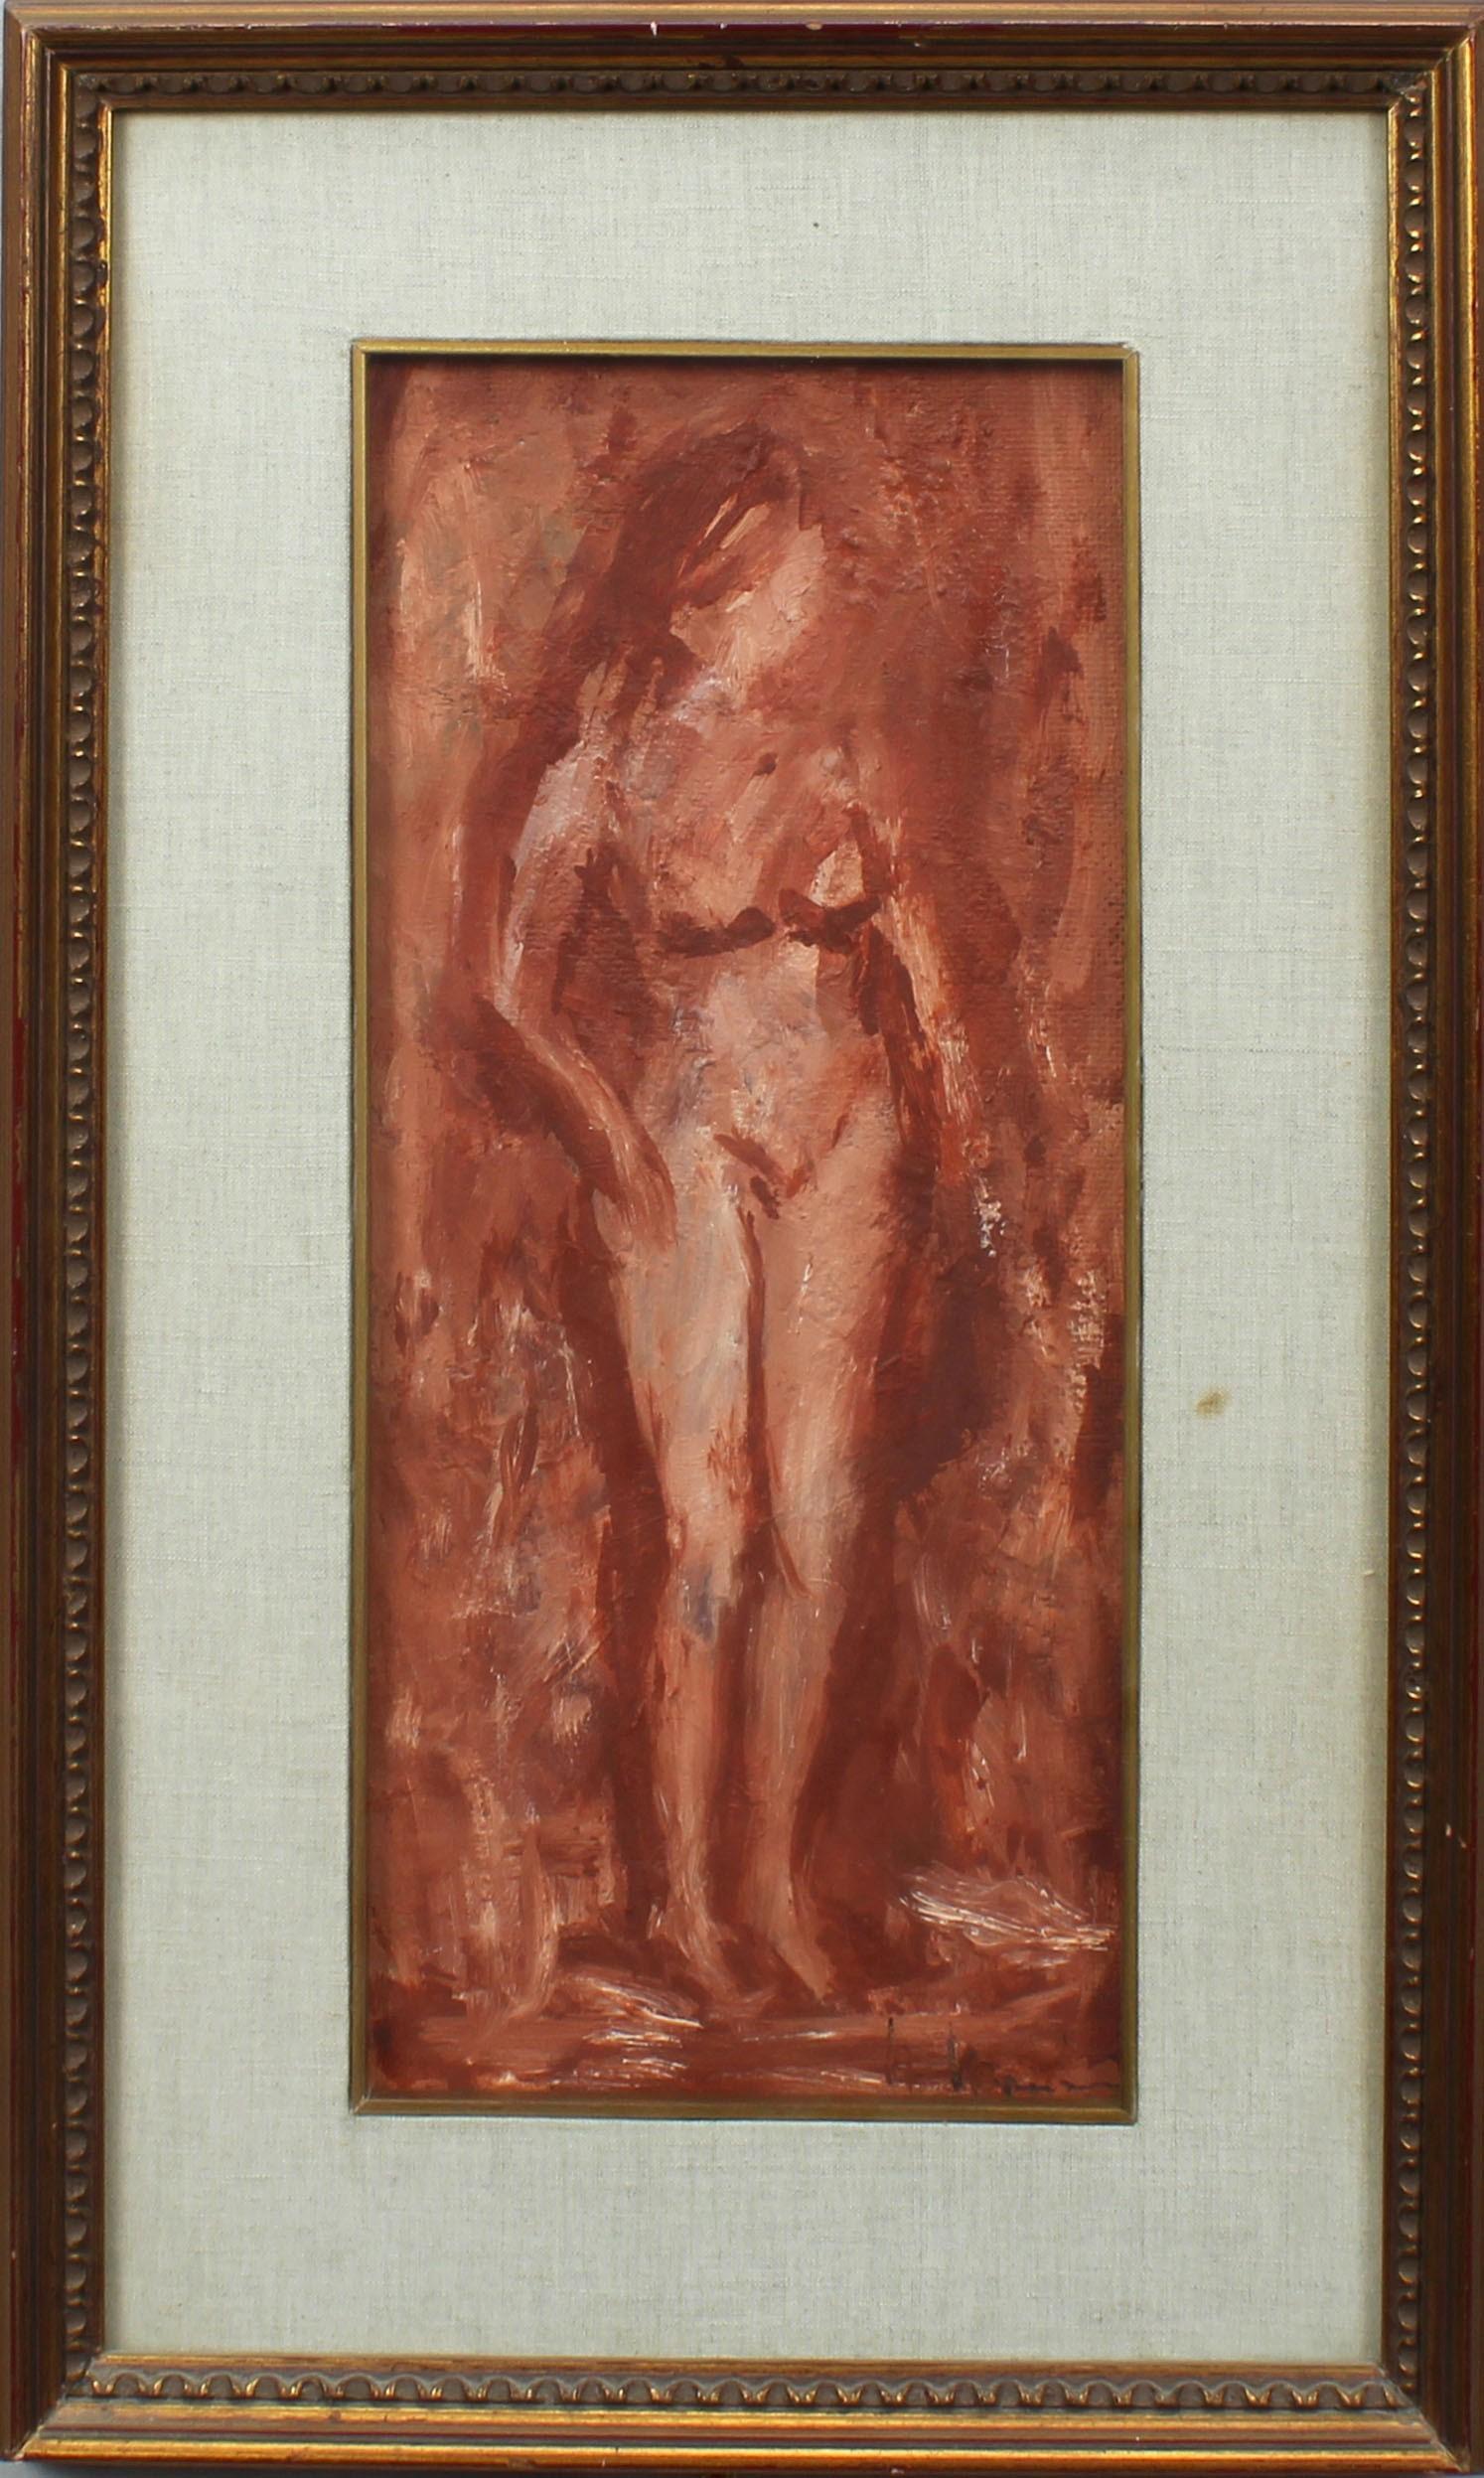 Lot 29 - Nudo, a firma Venturini, olio su tela cm. 16x38